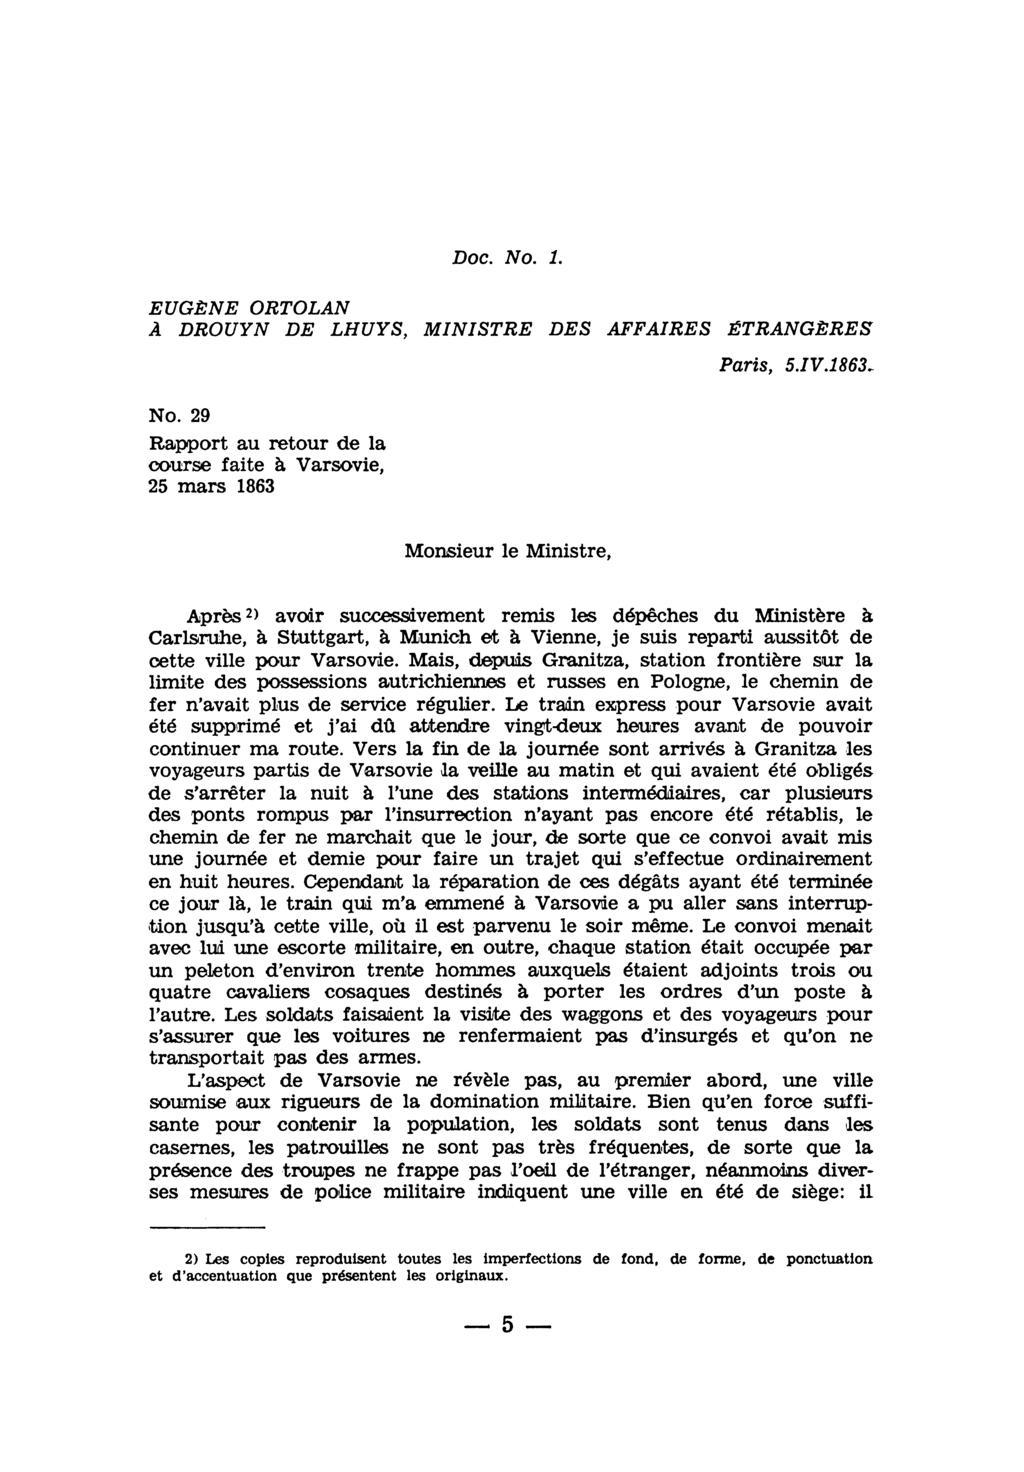 Violation De Domicile Jardin Génial Institutum Historicum Polonicum Roma E Antemurale Non Of 59 Best Of Violation De Domicile Jardin